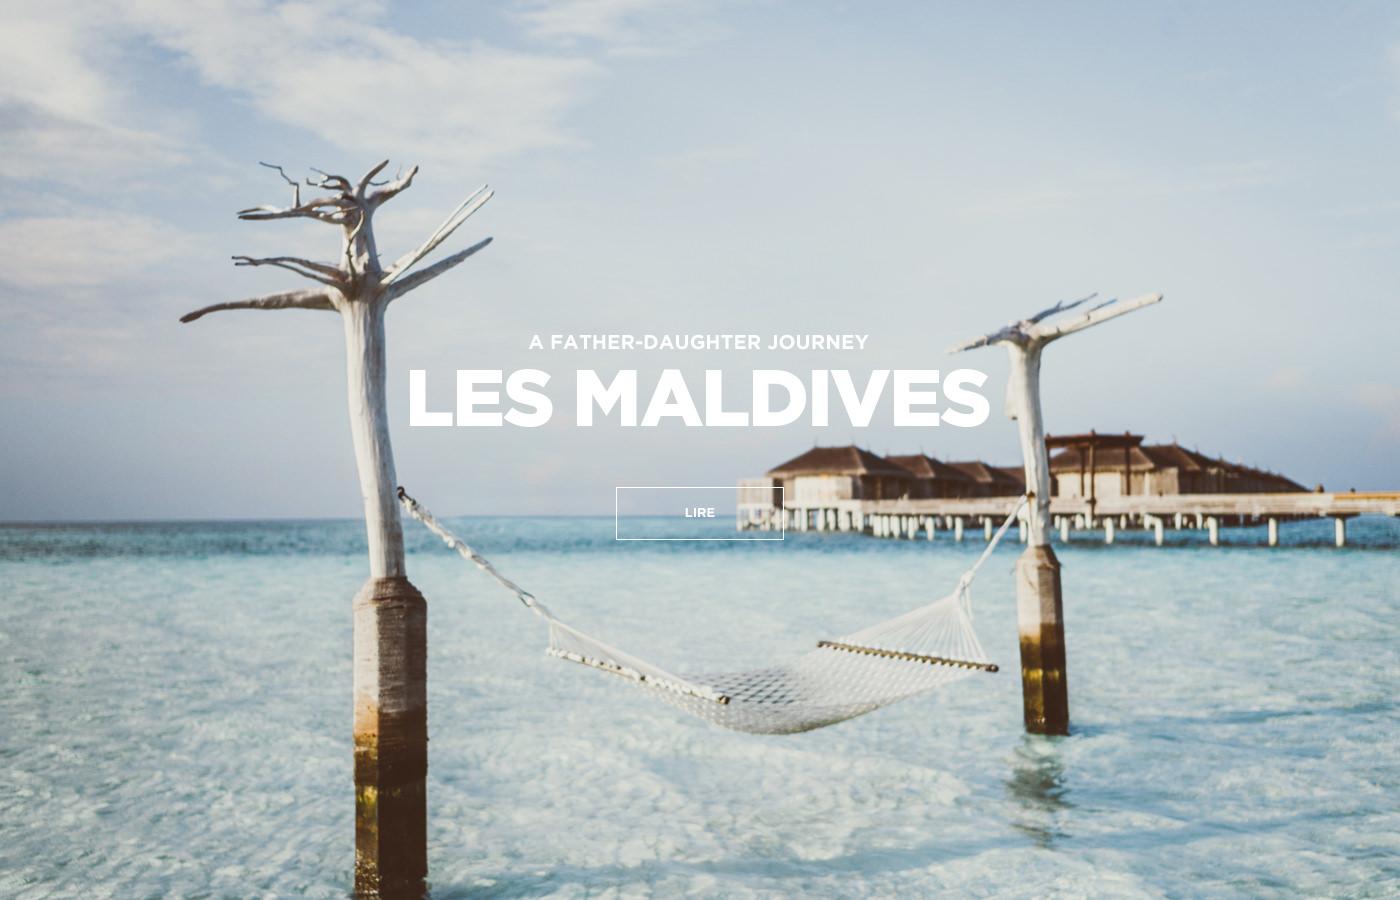 Blog Voyage Maldives Voyager Seul Solo Avec Bebe Enfant